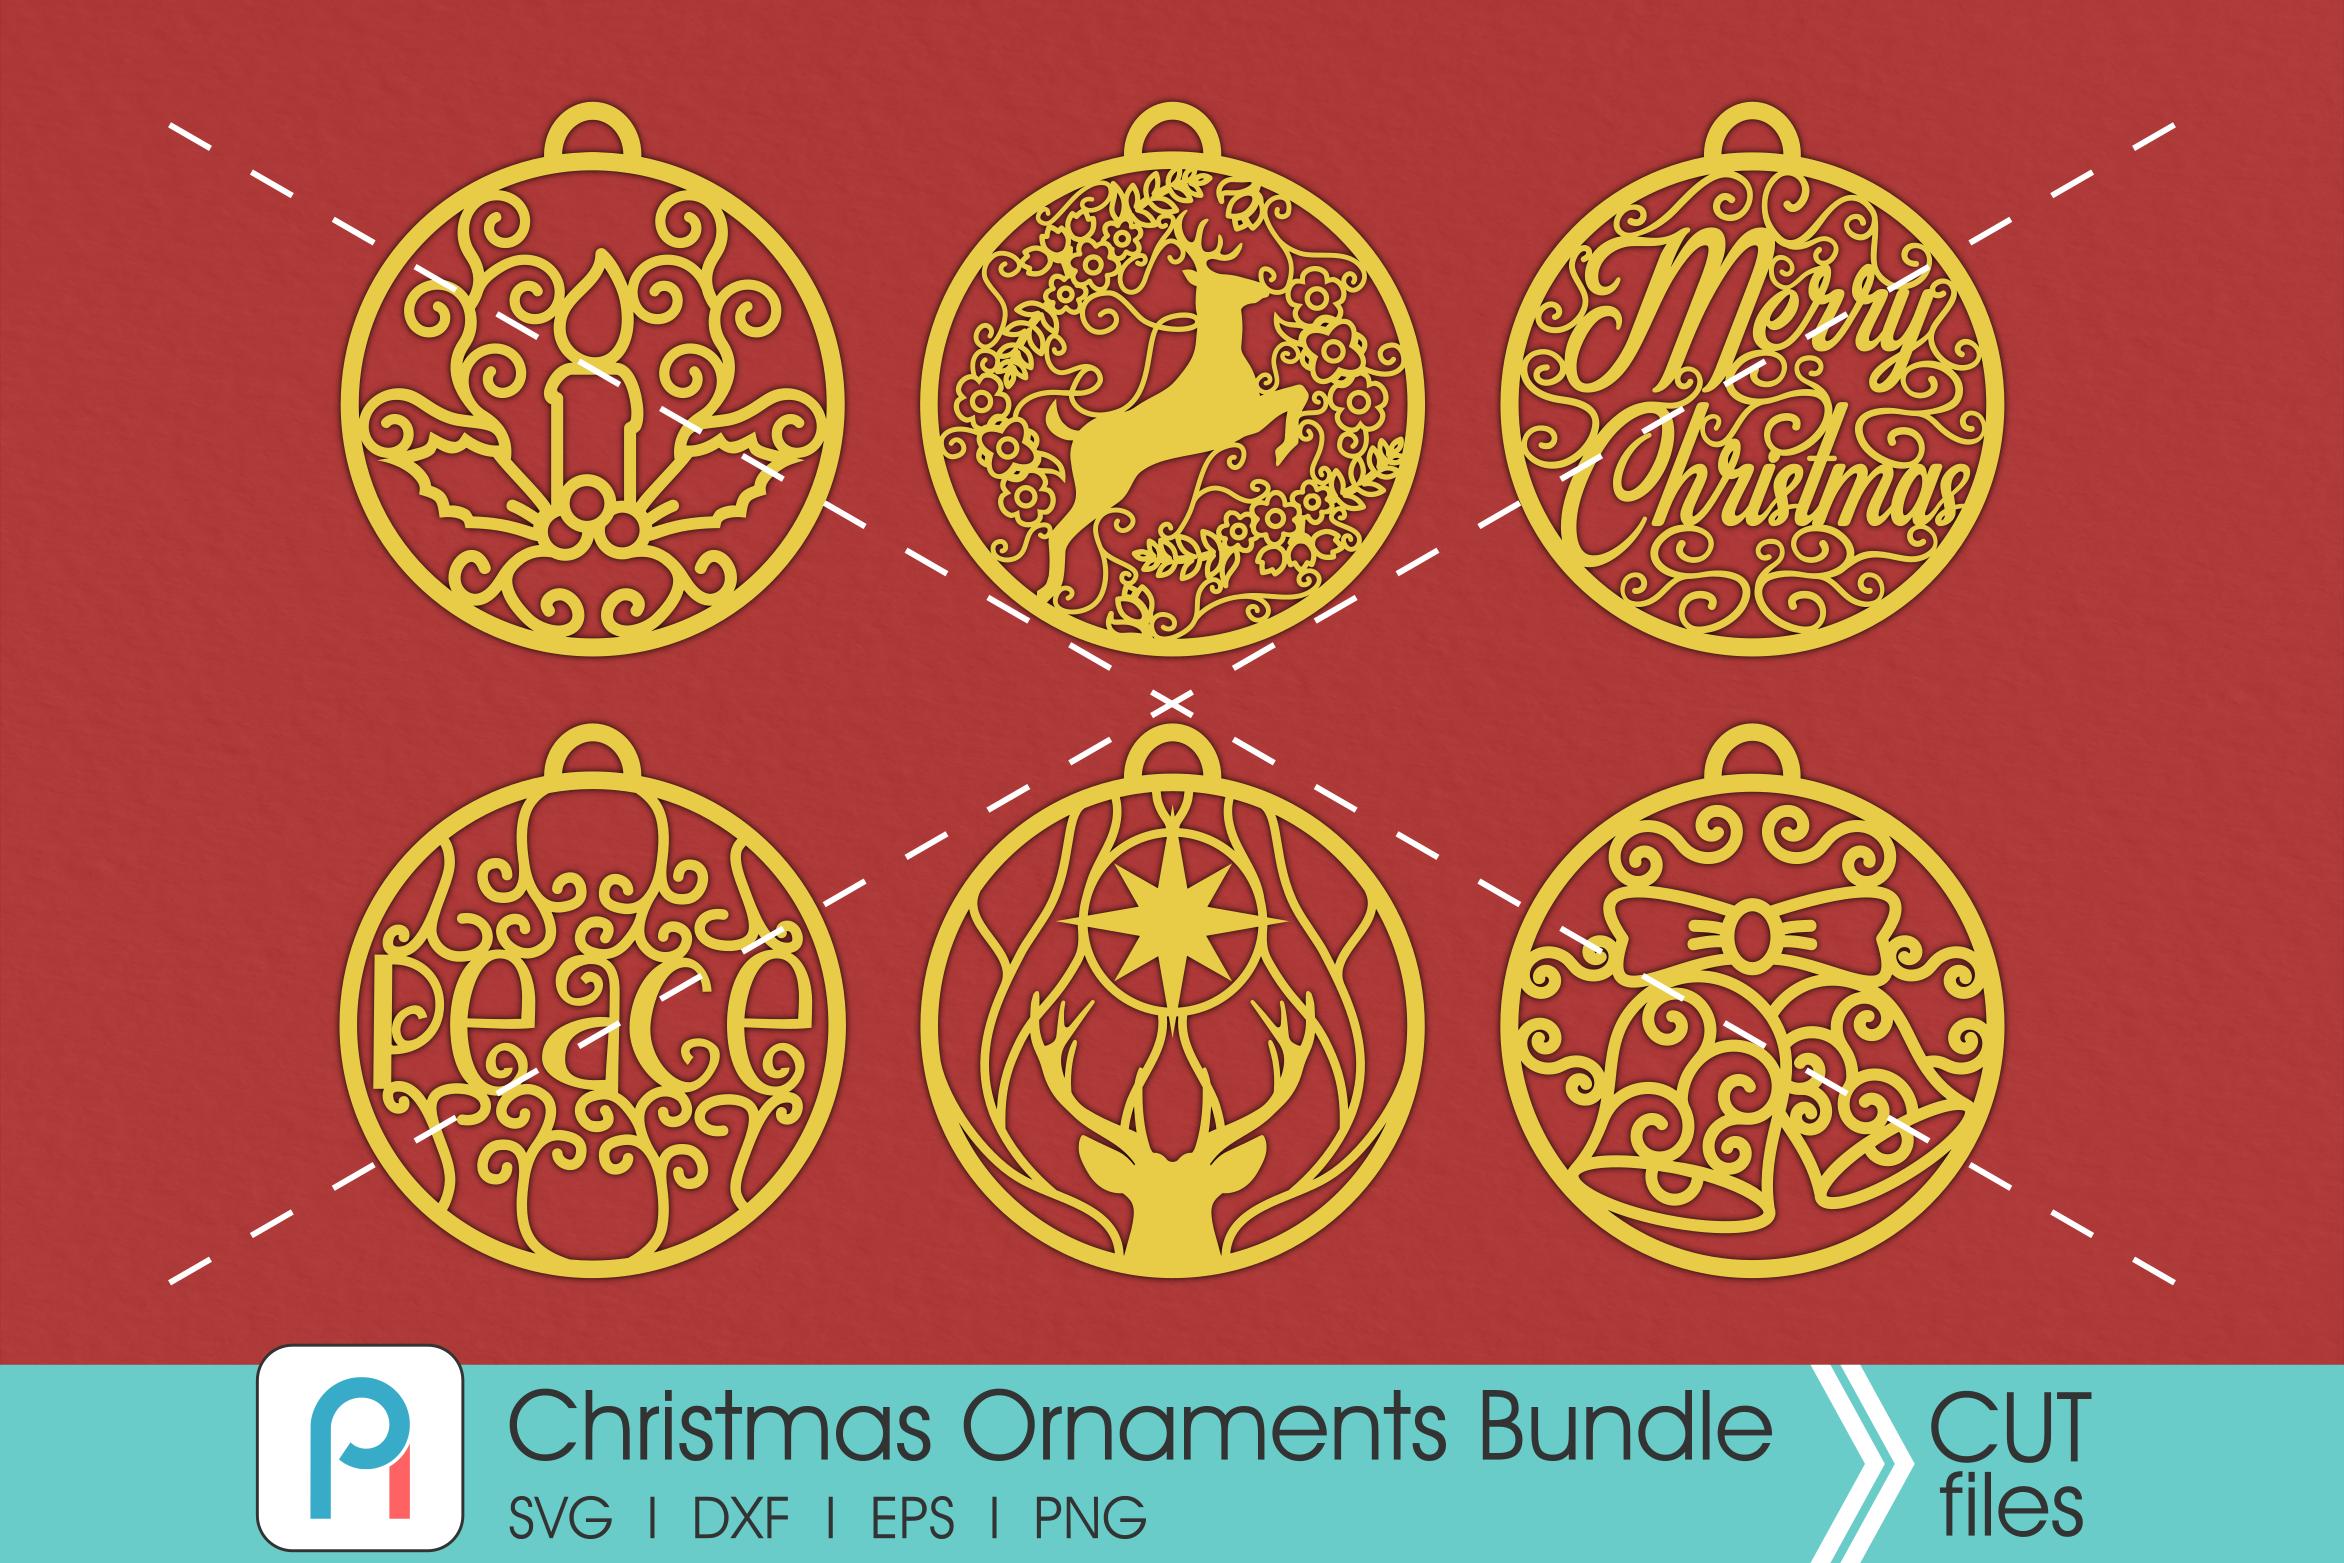 Christmas Ornaments Svg Christmas Balls Svg Baubles Svg Svg Files By Pinoyart Thehungryjpeg Com